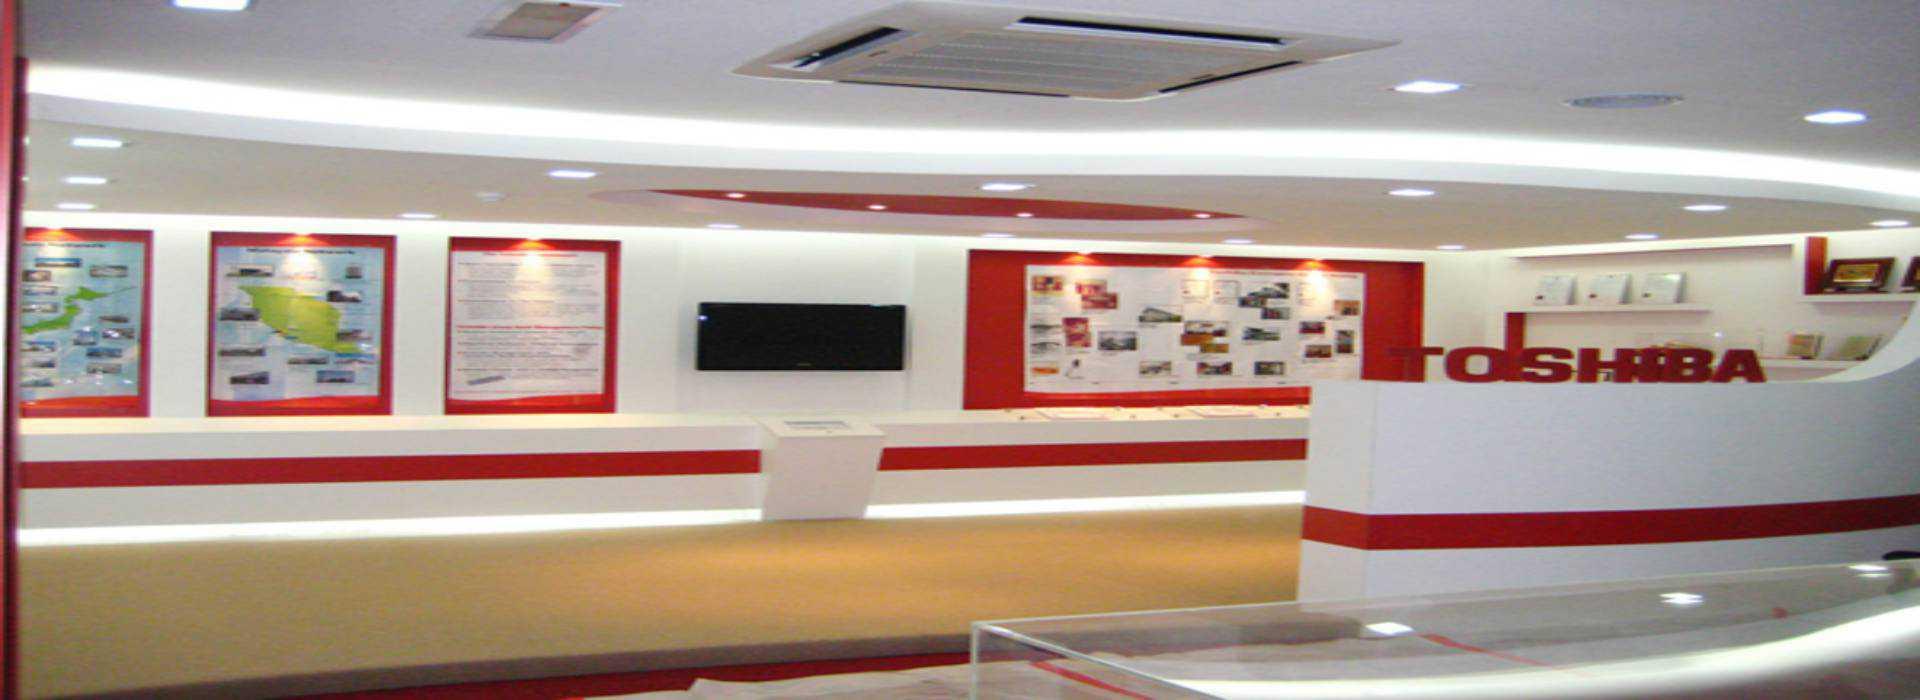 Toshiba Malaysia Customer Service Number, Address